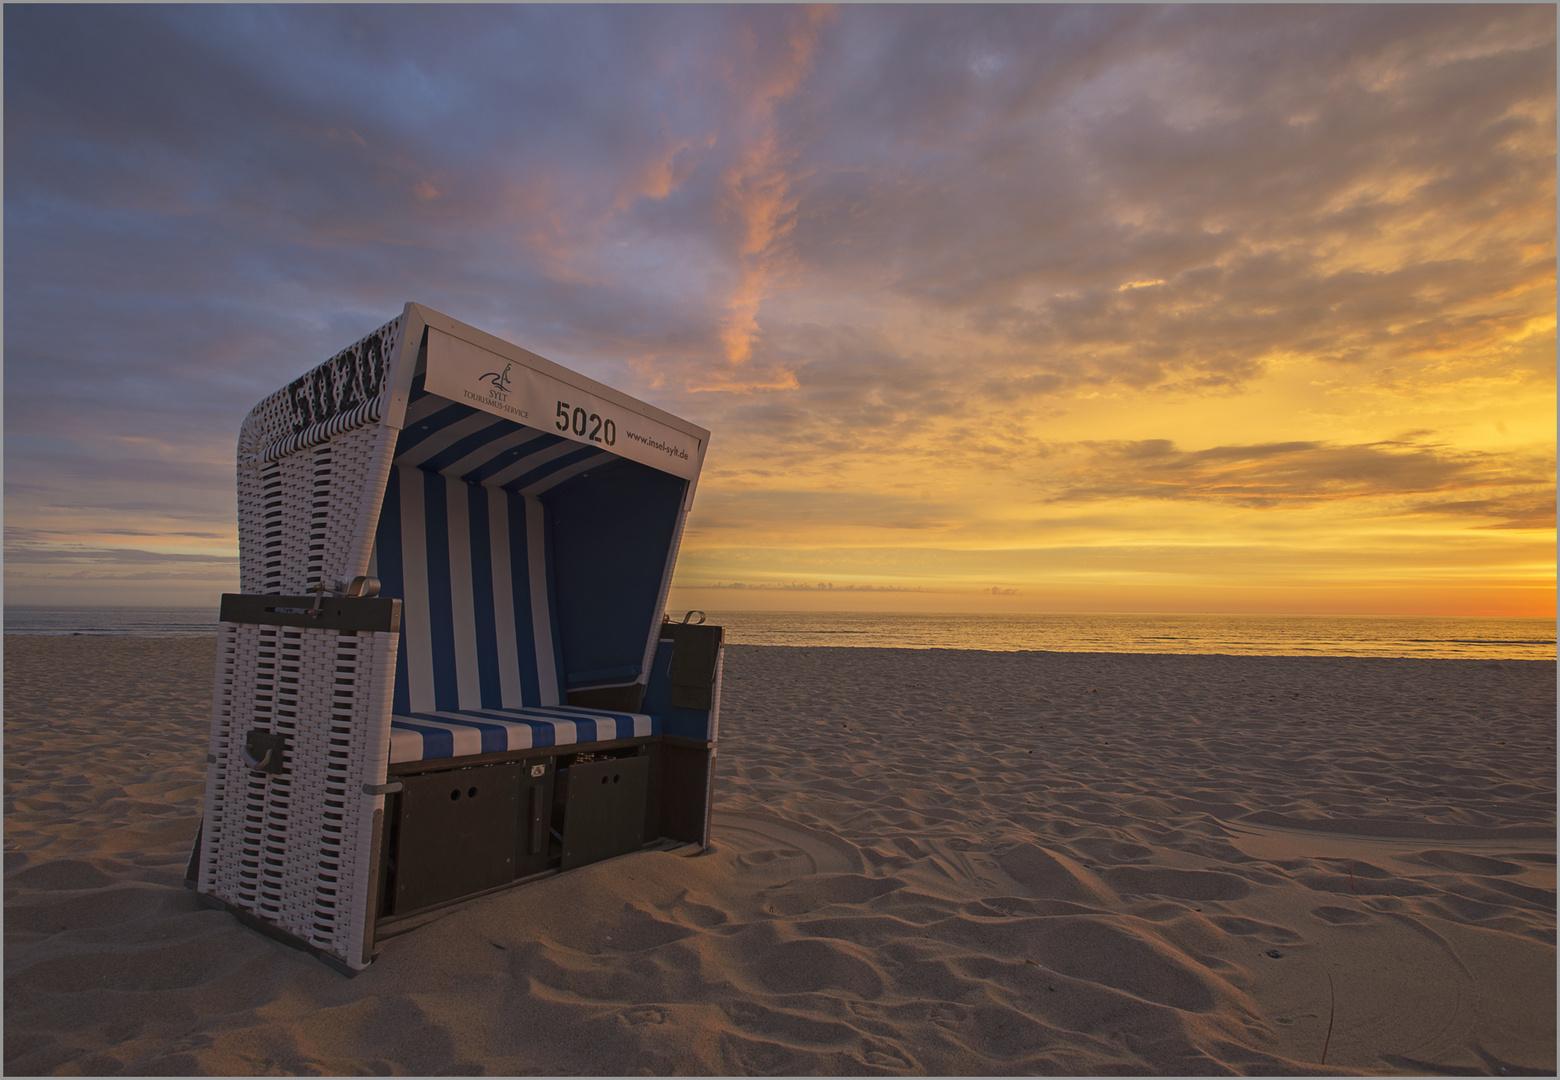 Strandkorb sonnenuntergang  Strandkorb im Sonnenuntergang Foto & Bild | deutschland, europe ...